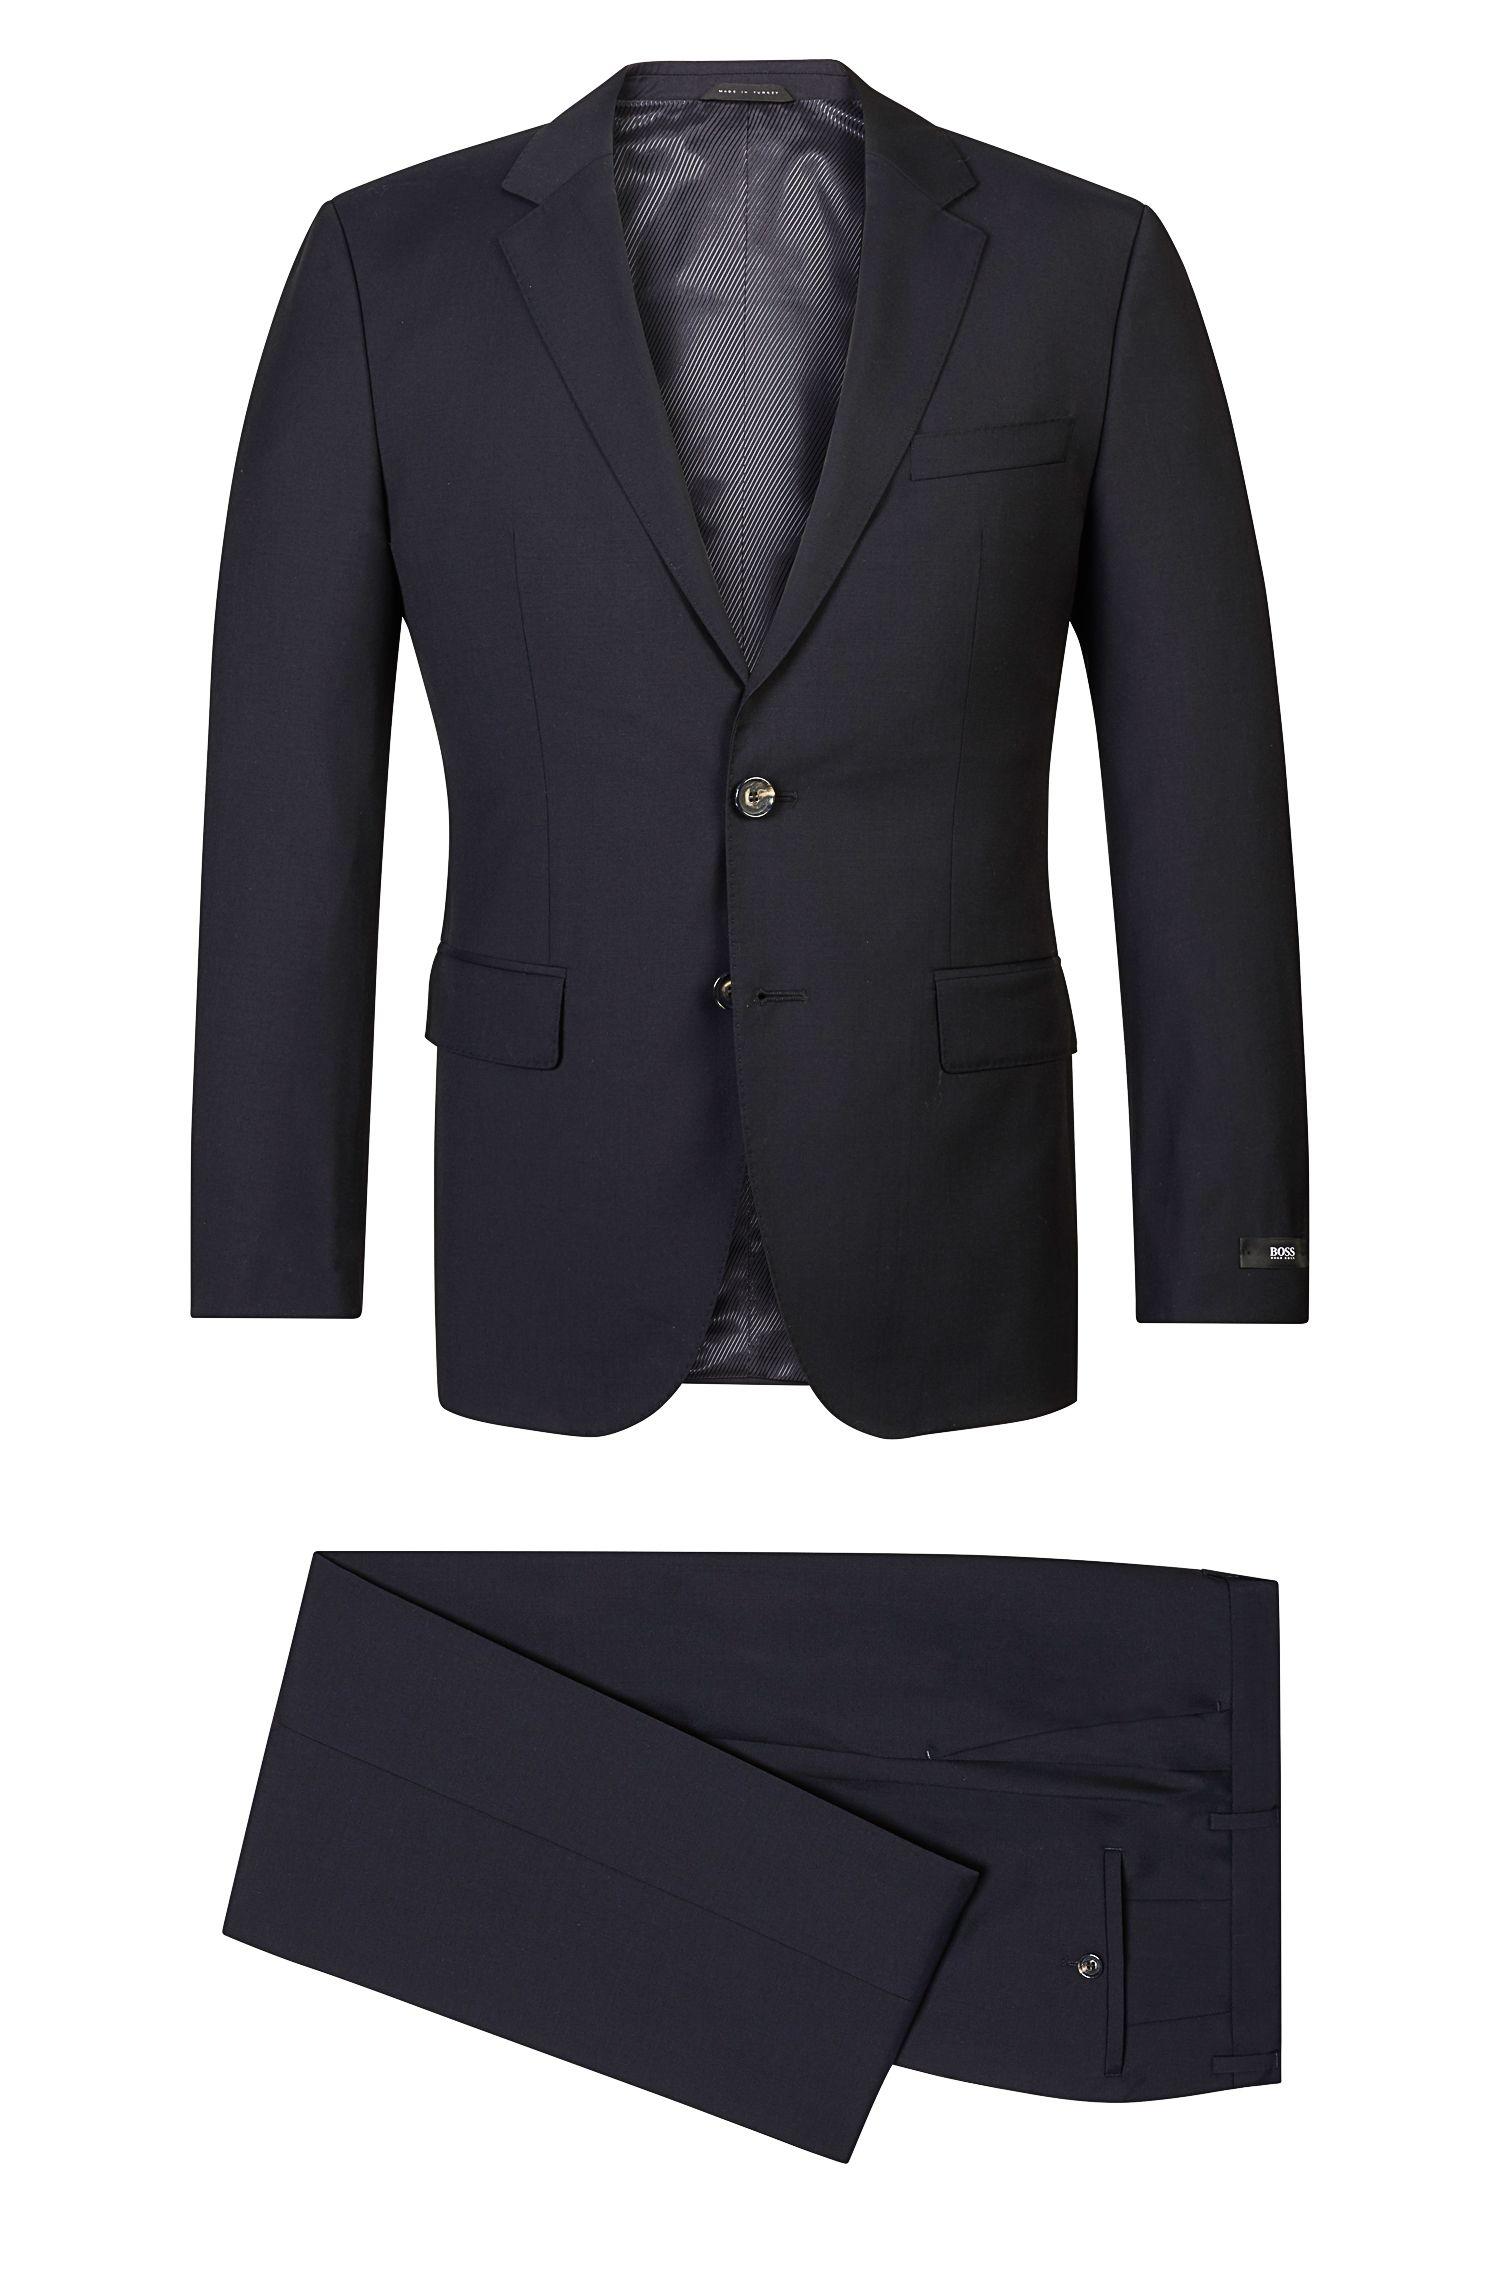 Super 120 Italian Virgin Wool Suit, Regular Fit   The James/Sharp